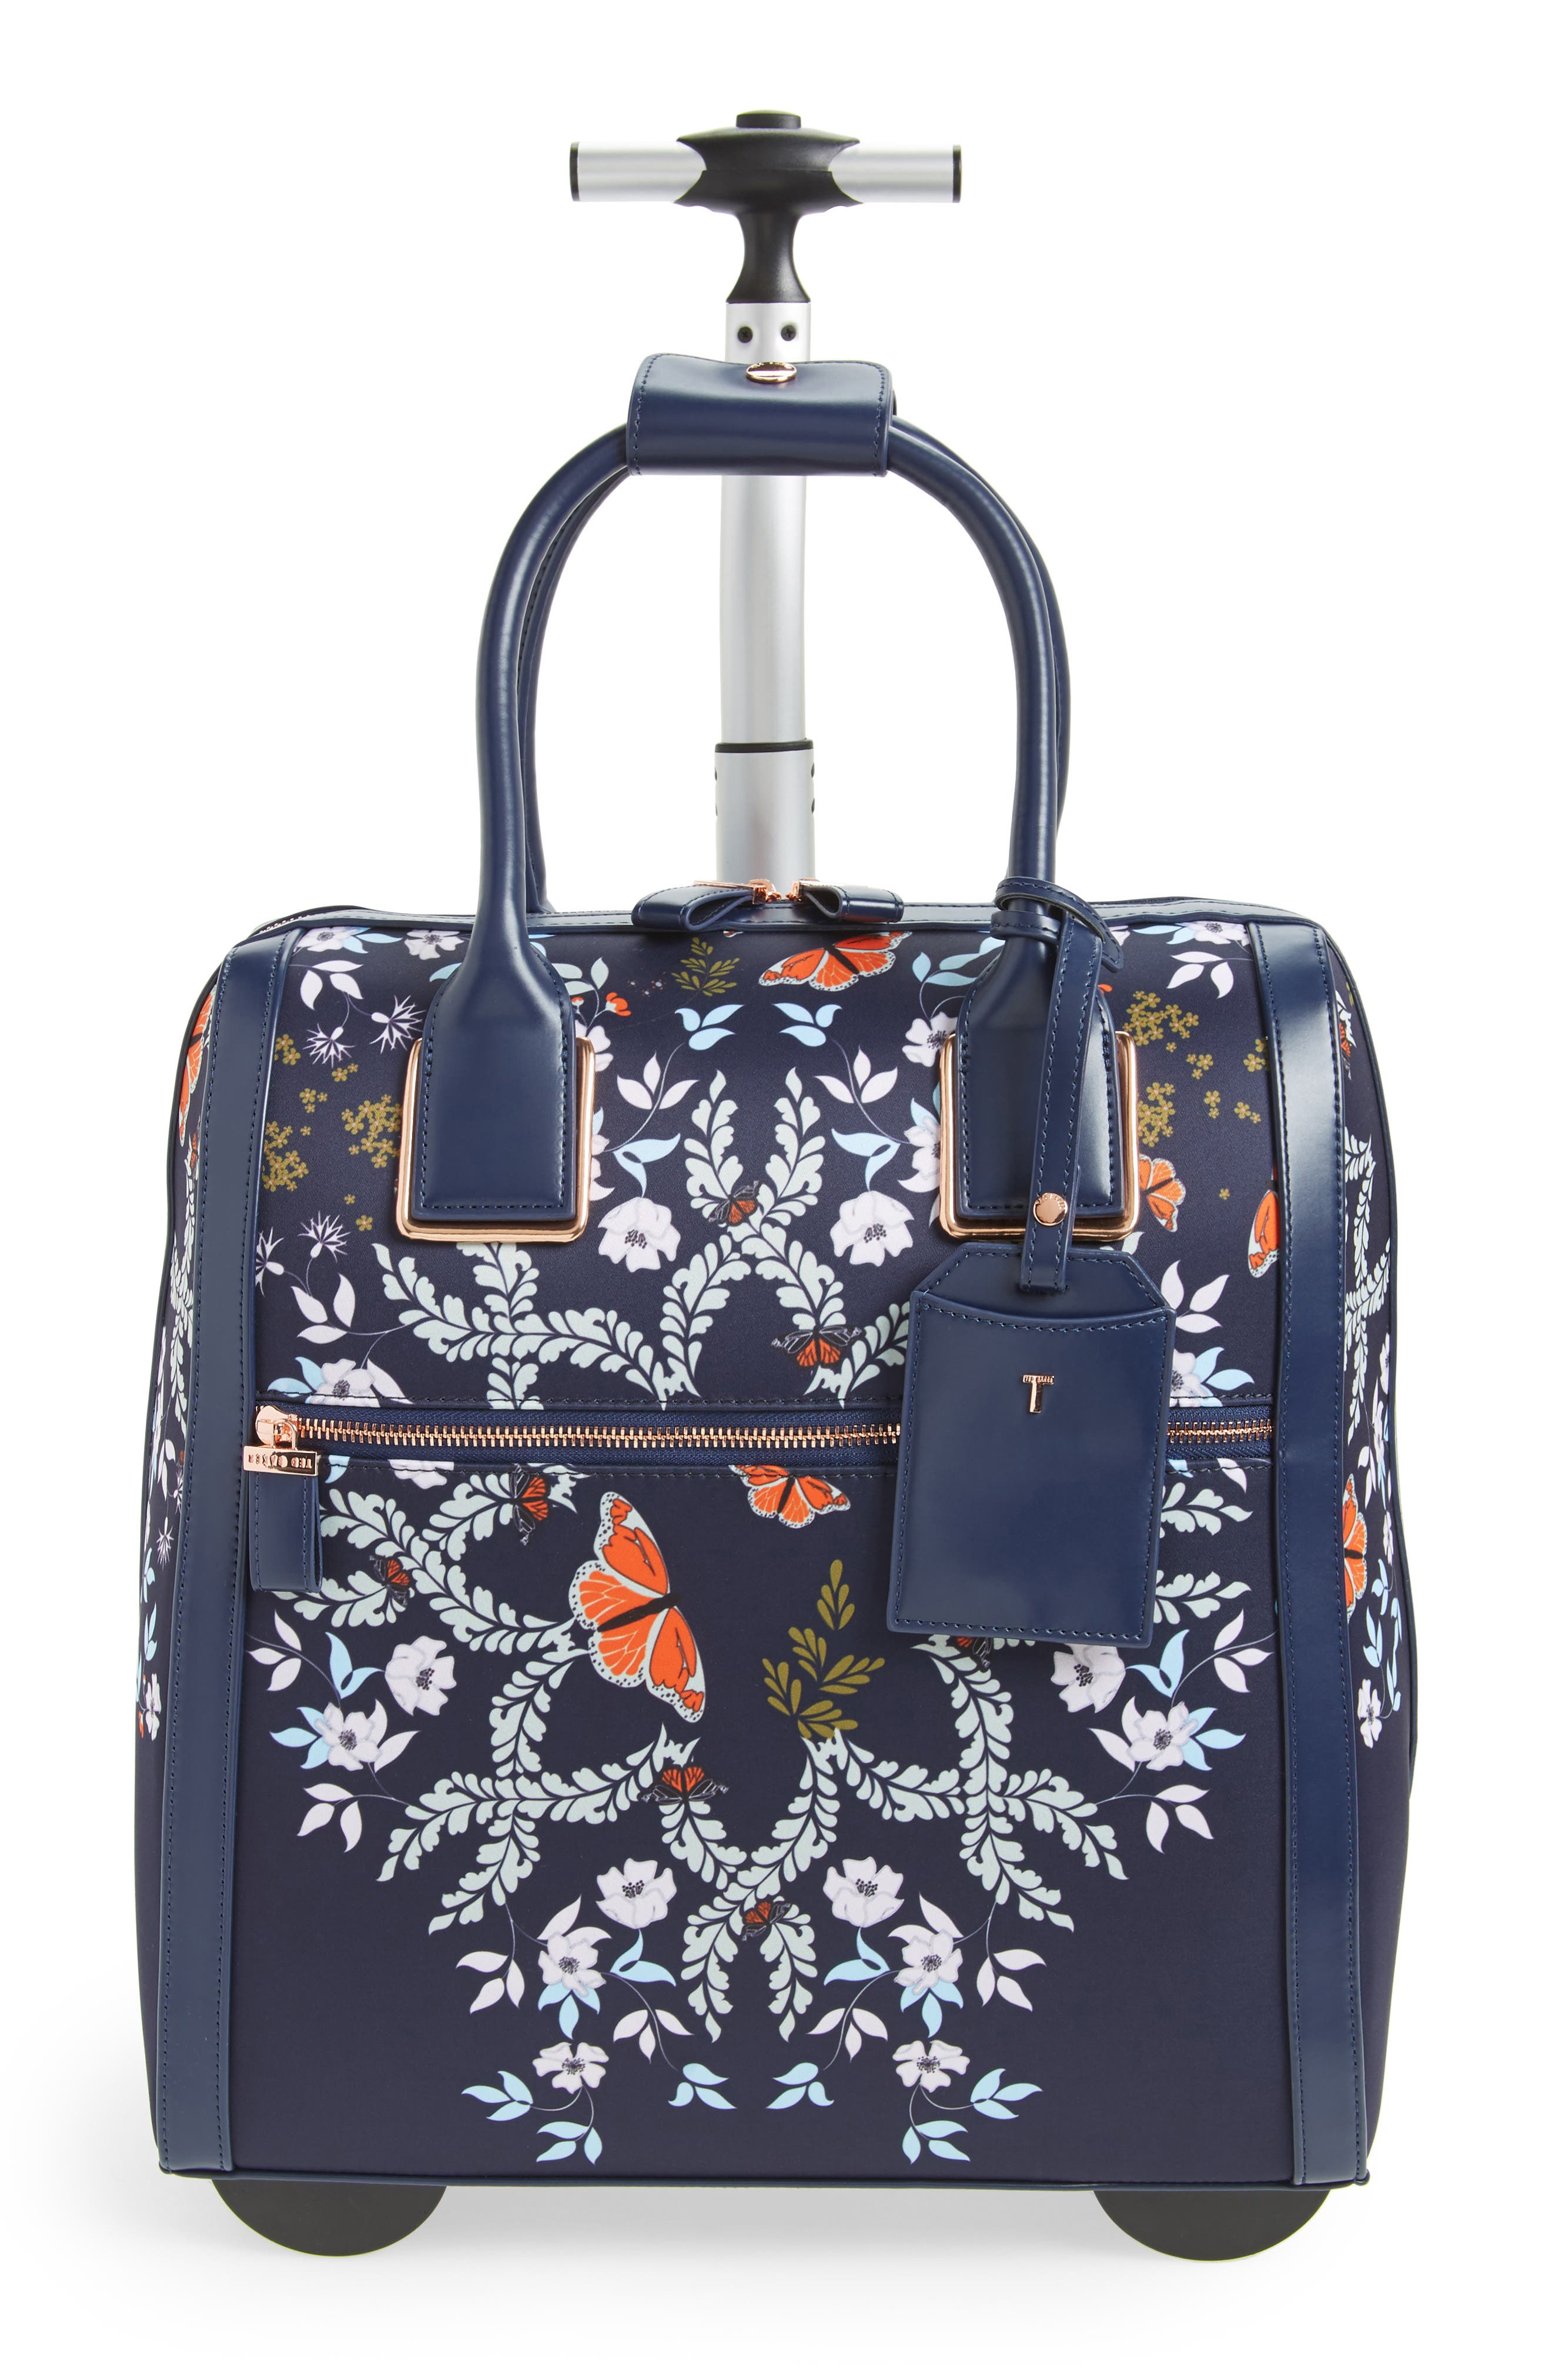 Ted Baker London Dafni - Kyoto Gardens Travel Bag